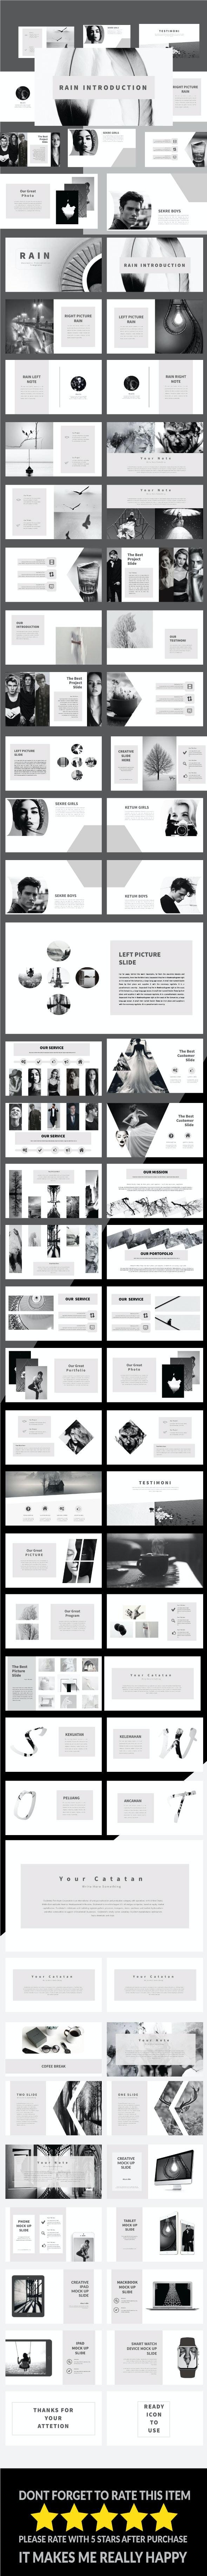 Rain - Keynote Templates - Business PowerPoint Templates